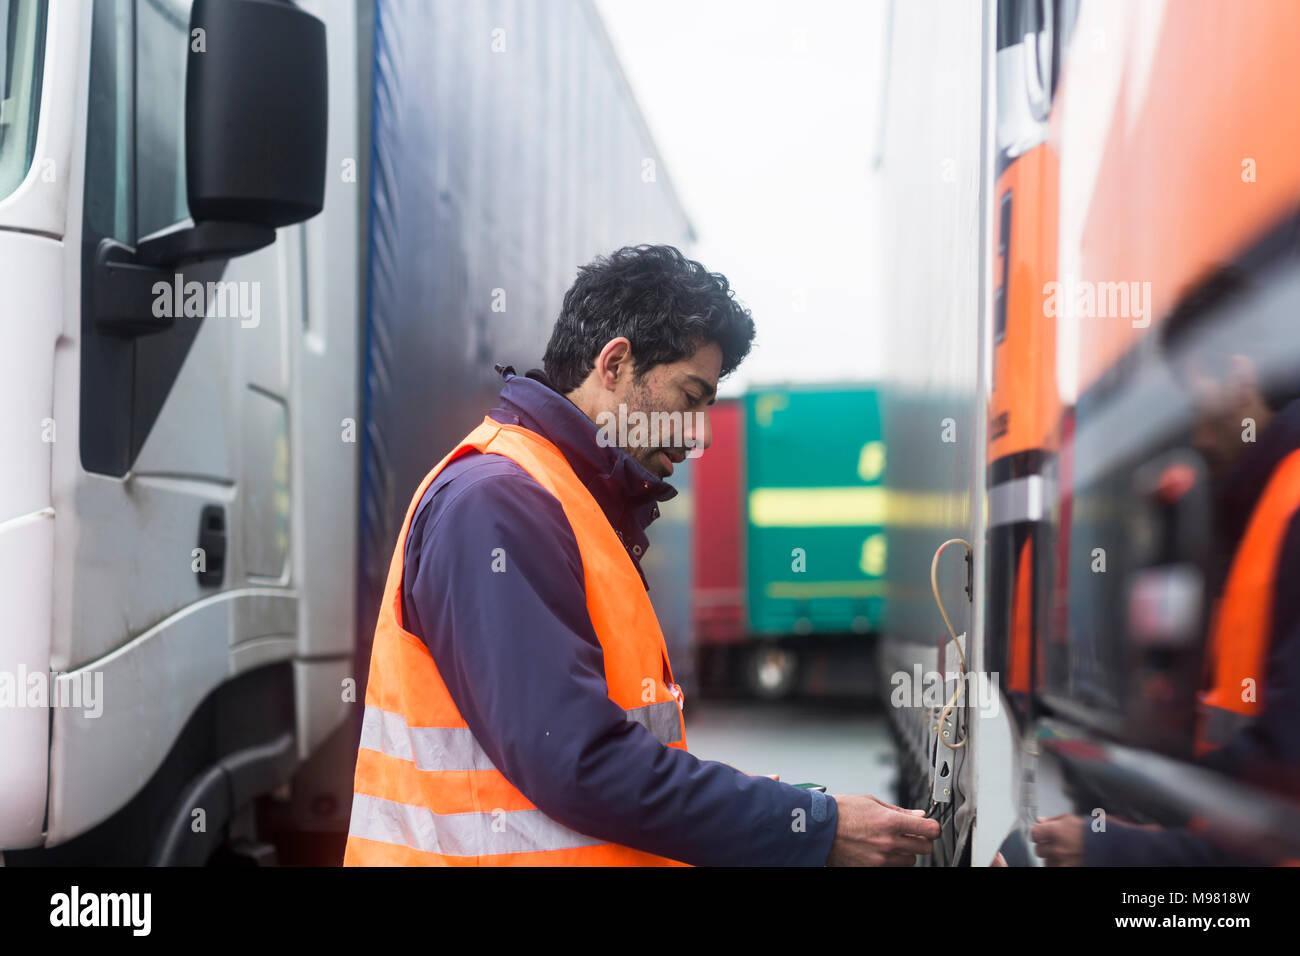 Man wearing reflective vest examining truck - Stock Image